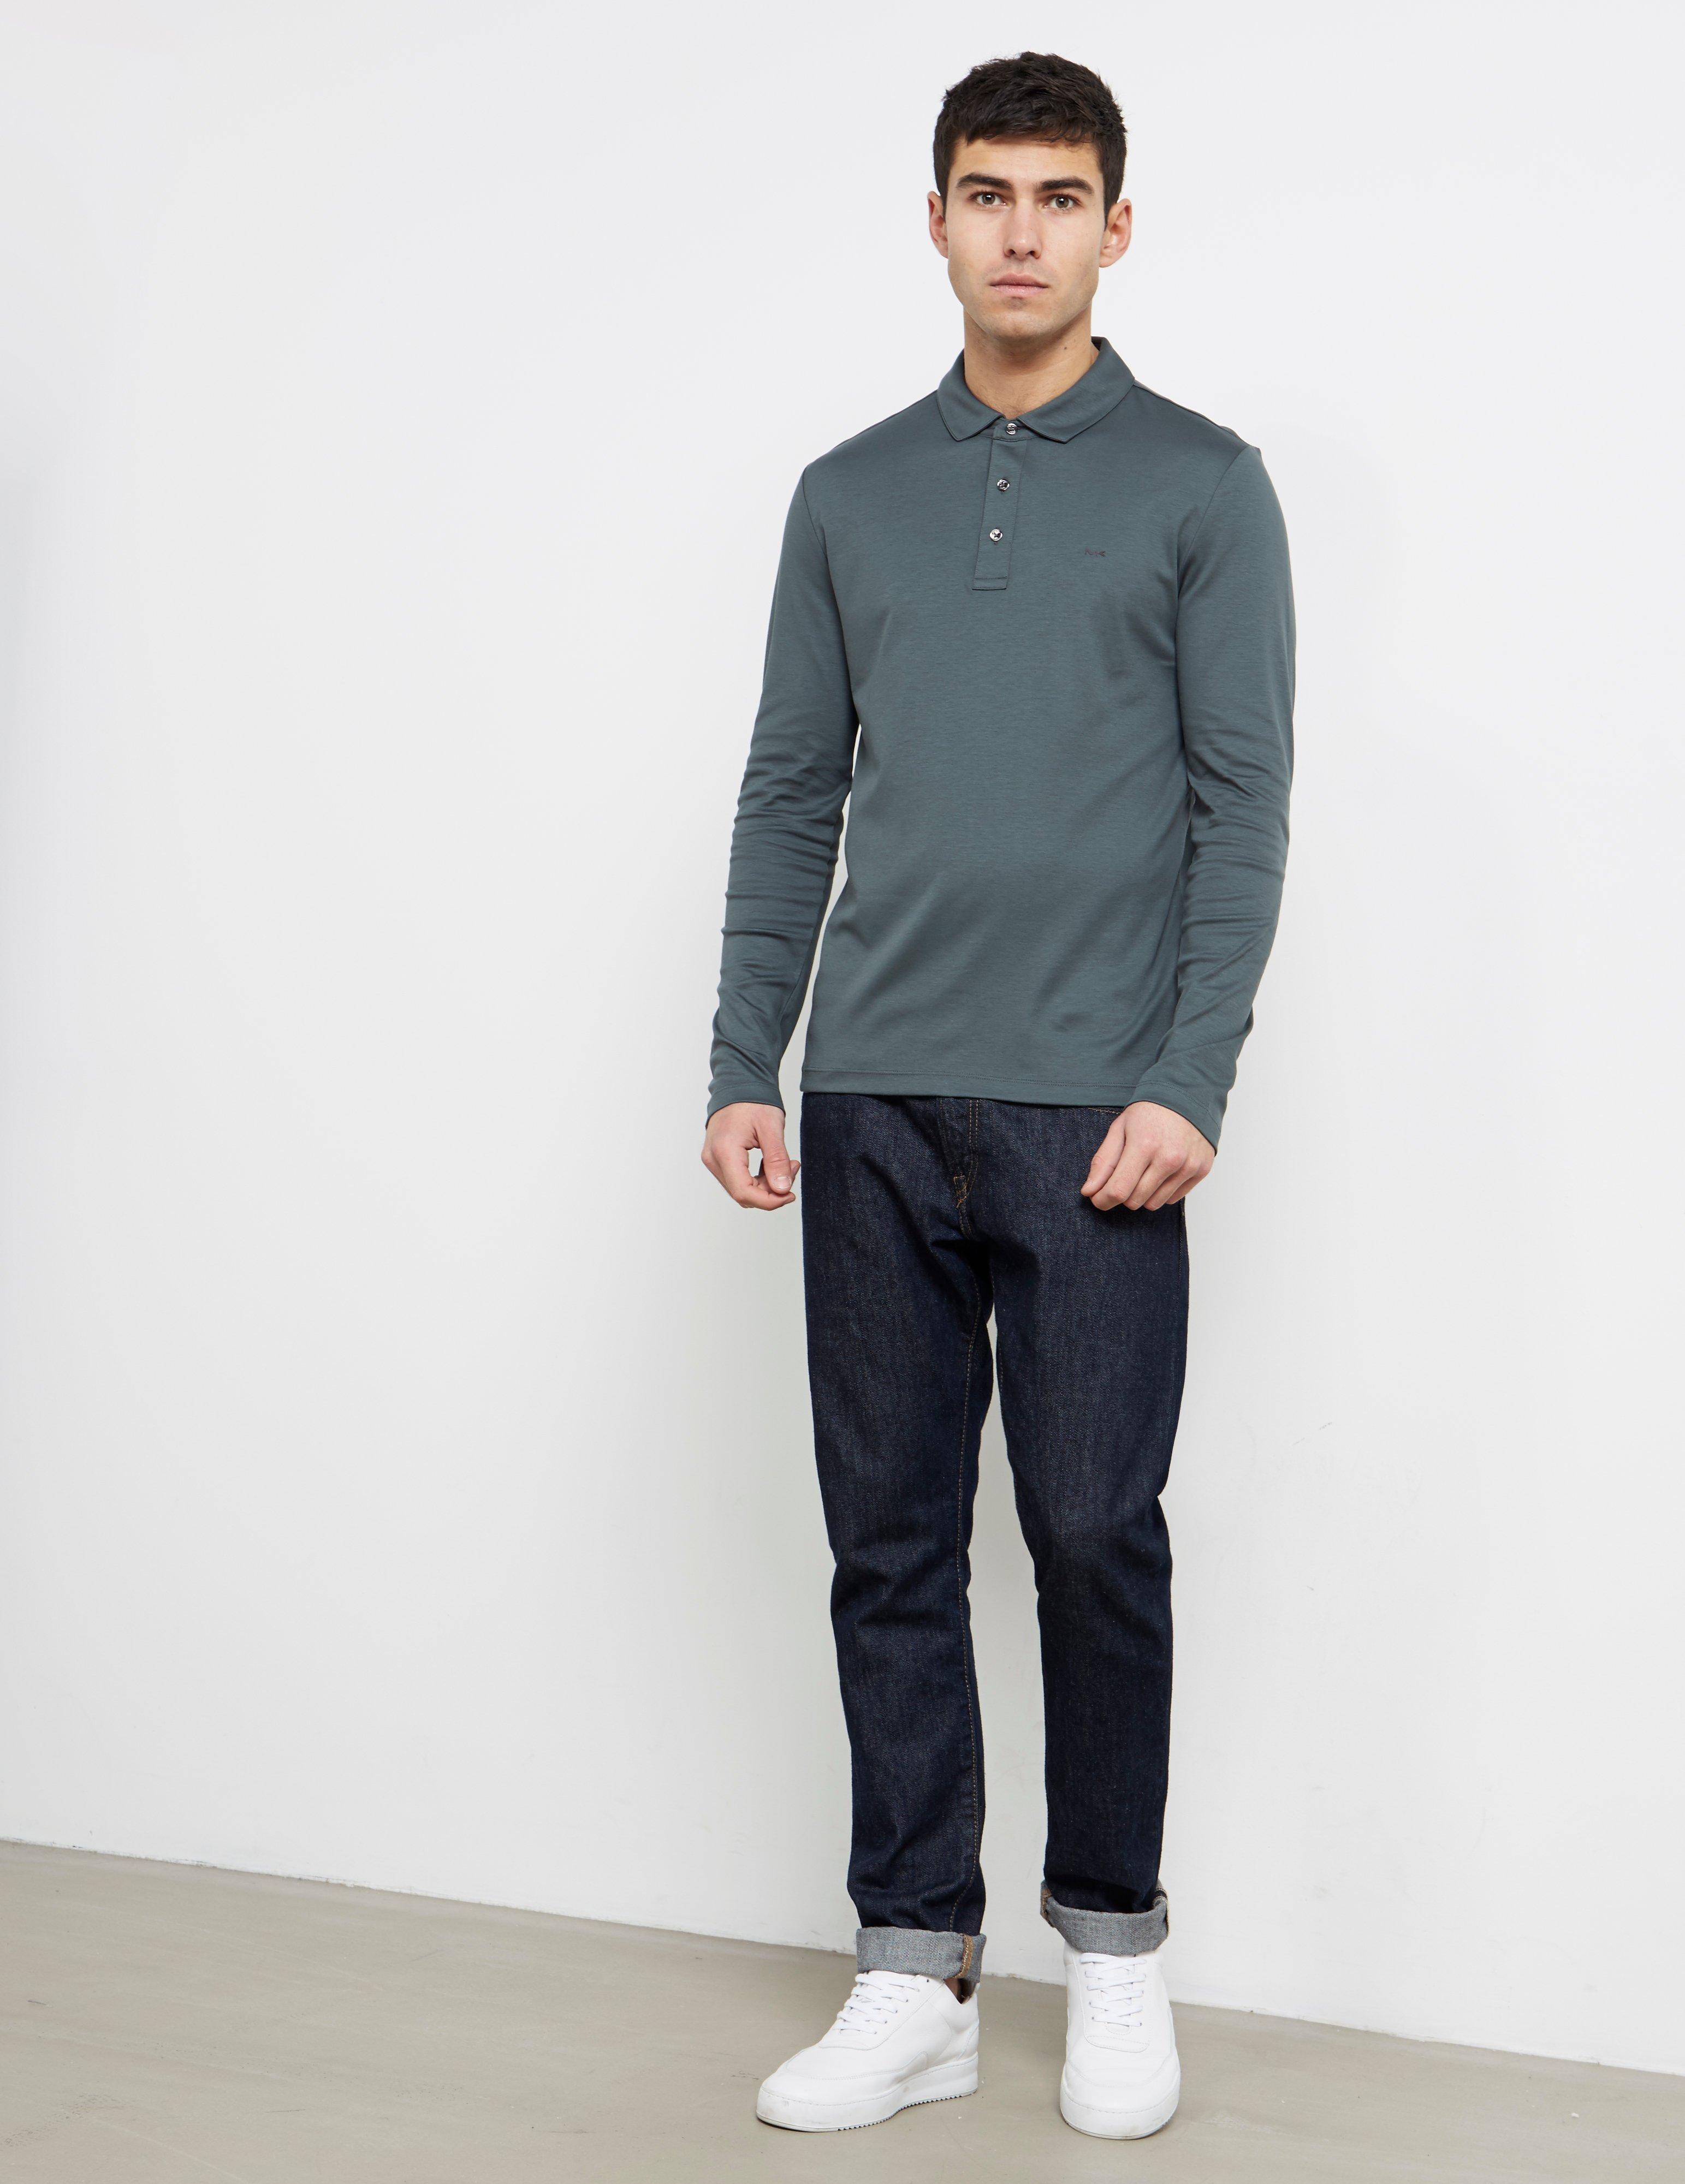 12bfac63 Lyst - Michael Kors Mens Sleek Long Sleeve Polo Shirt Green in Green for Men